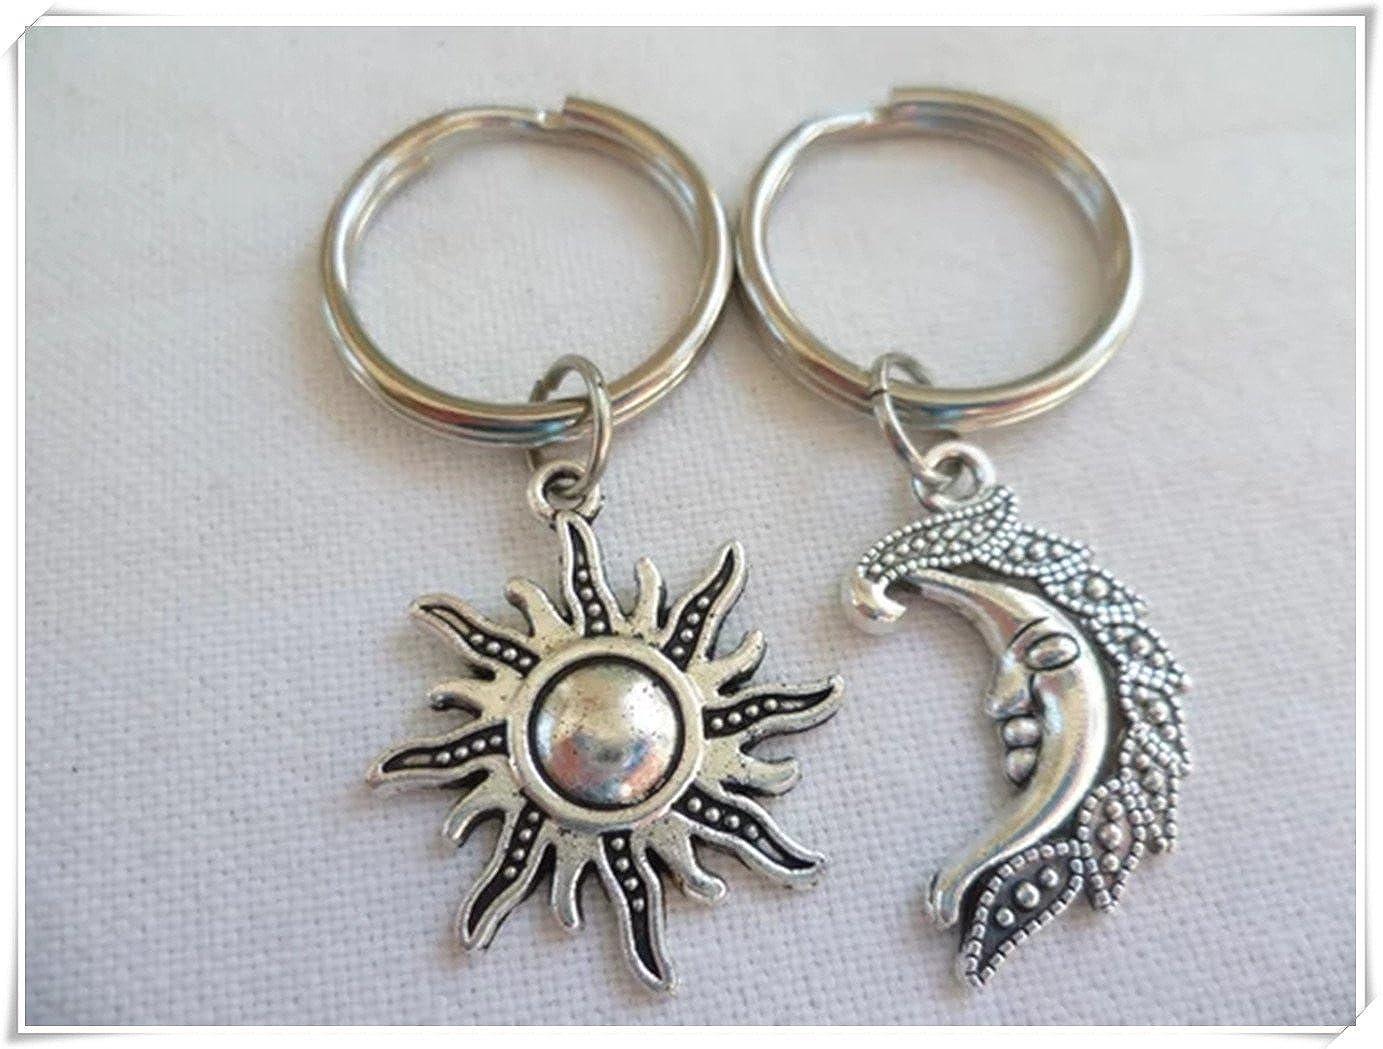 JUN sole, luna, portachiavi, portachiavi a forma di luna, sole e luna moderne di gioielli, gioielli e unico 1314 JUN m1